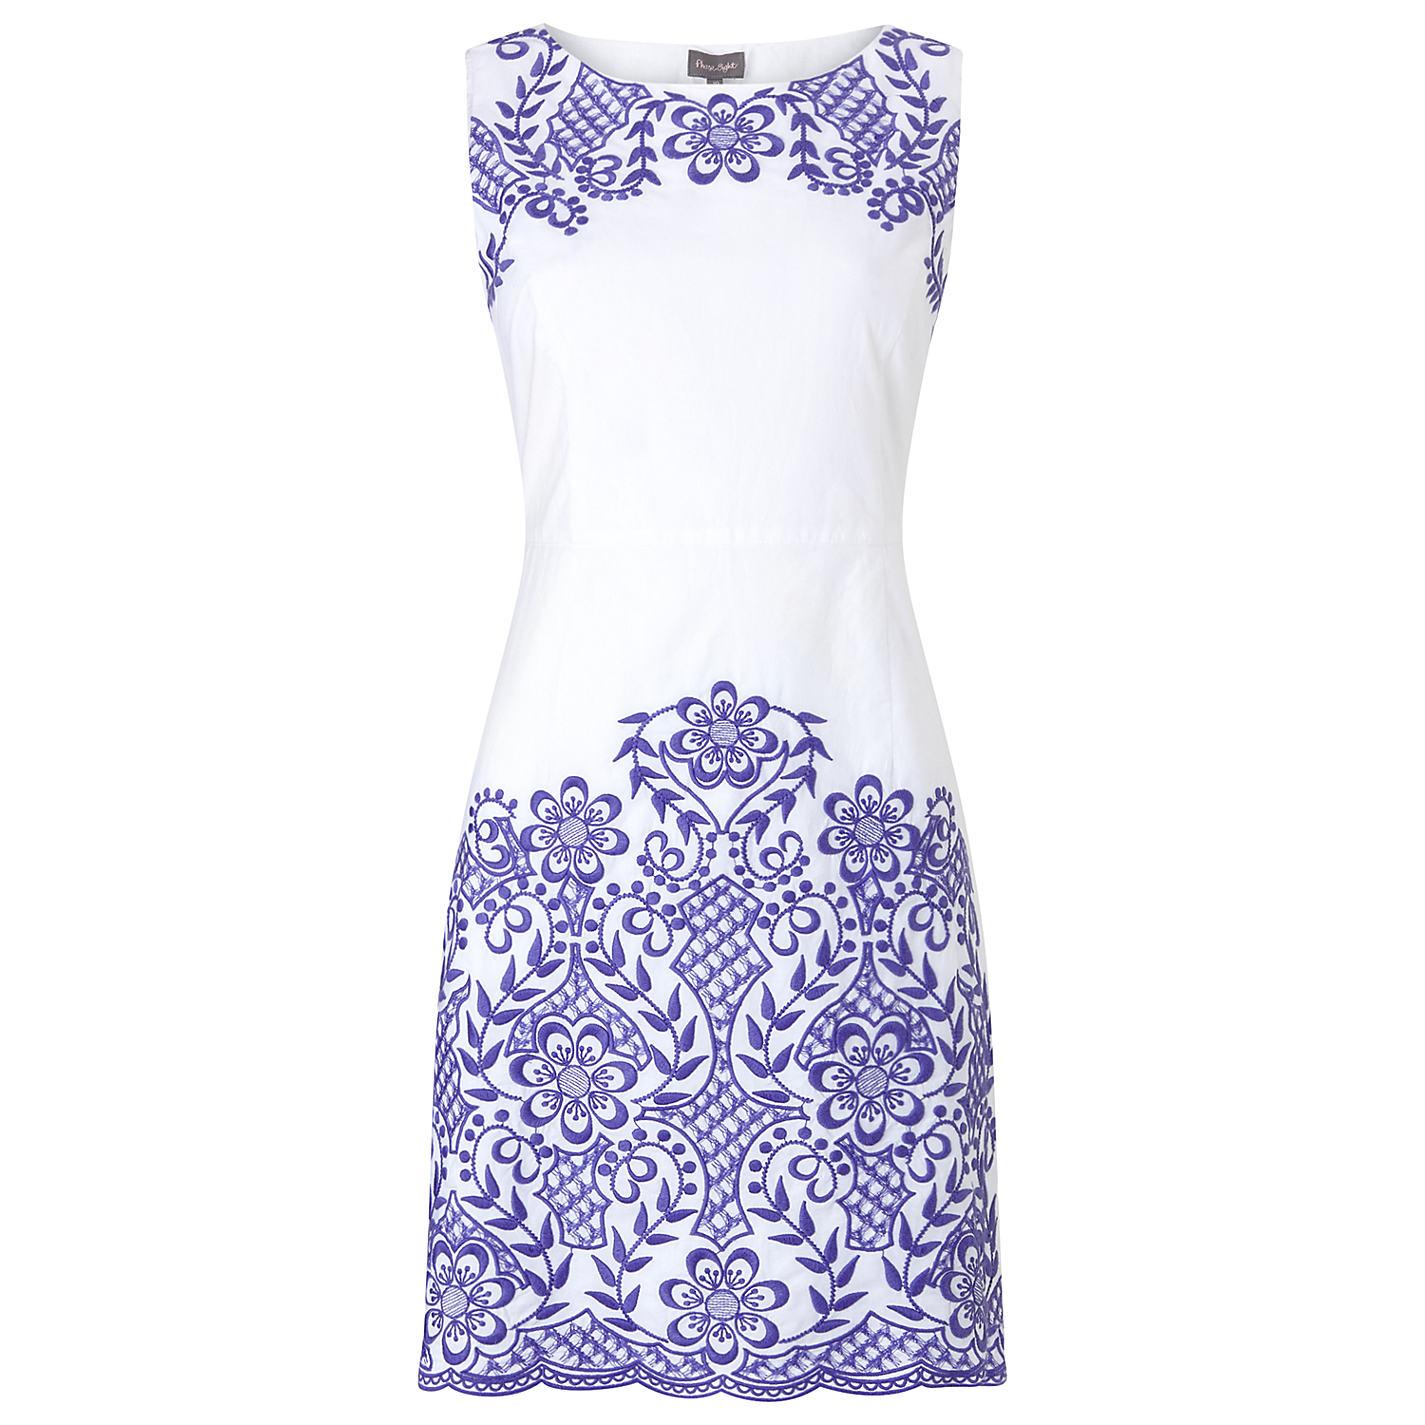 Phase 8 white dress 12